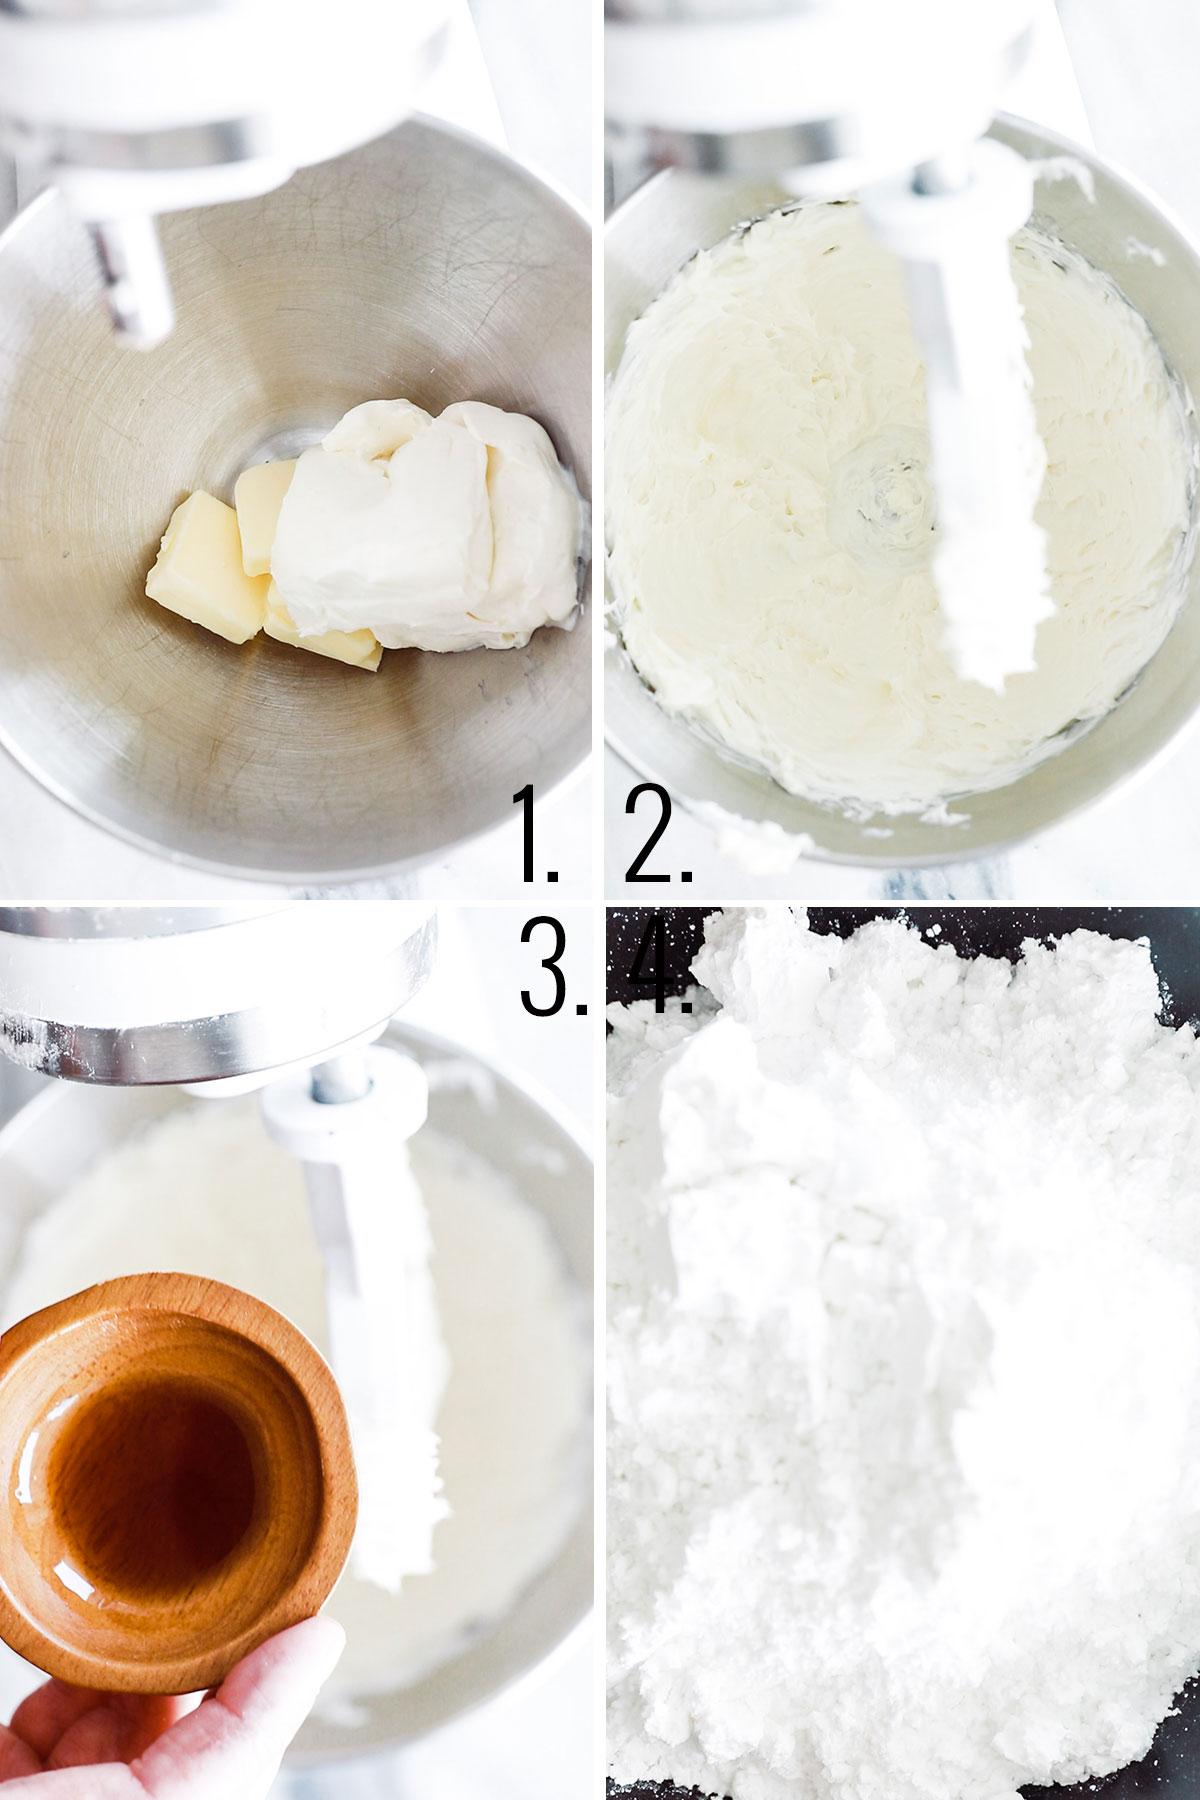 four process shots adding ingredients (butter, cream cheese, vanilla, milk and powder sugar) to mixer